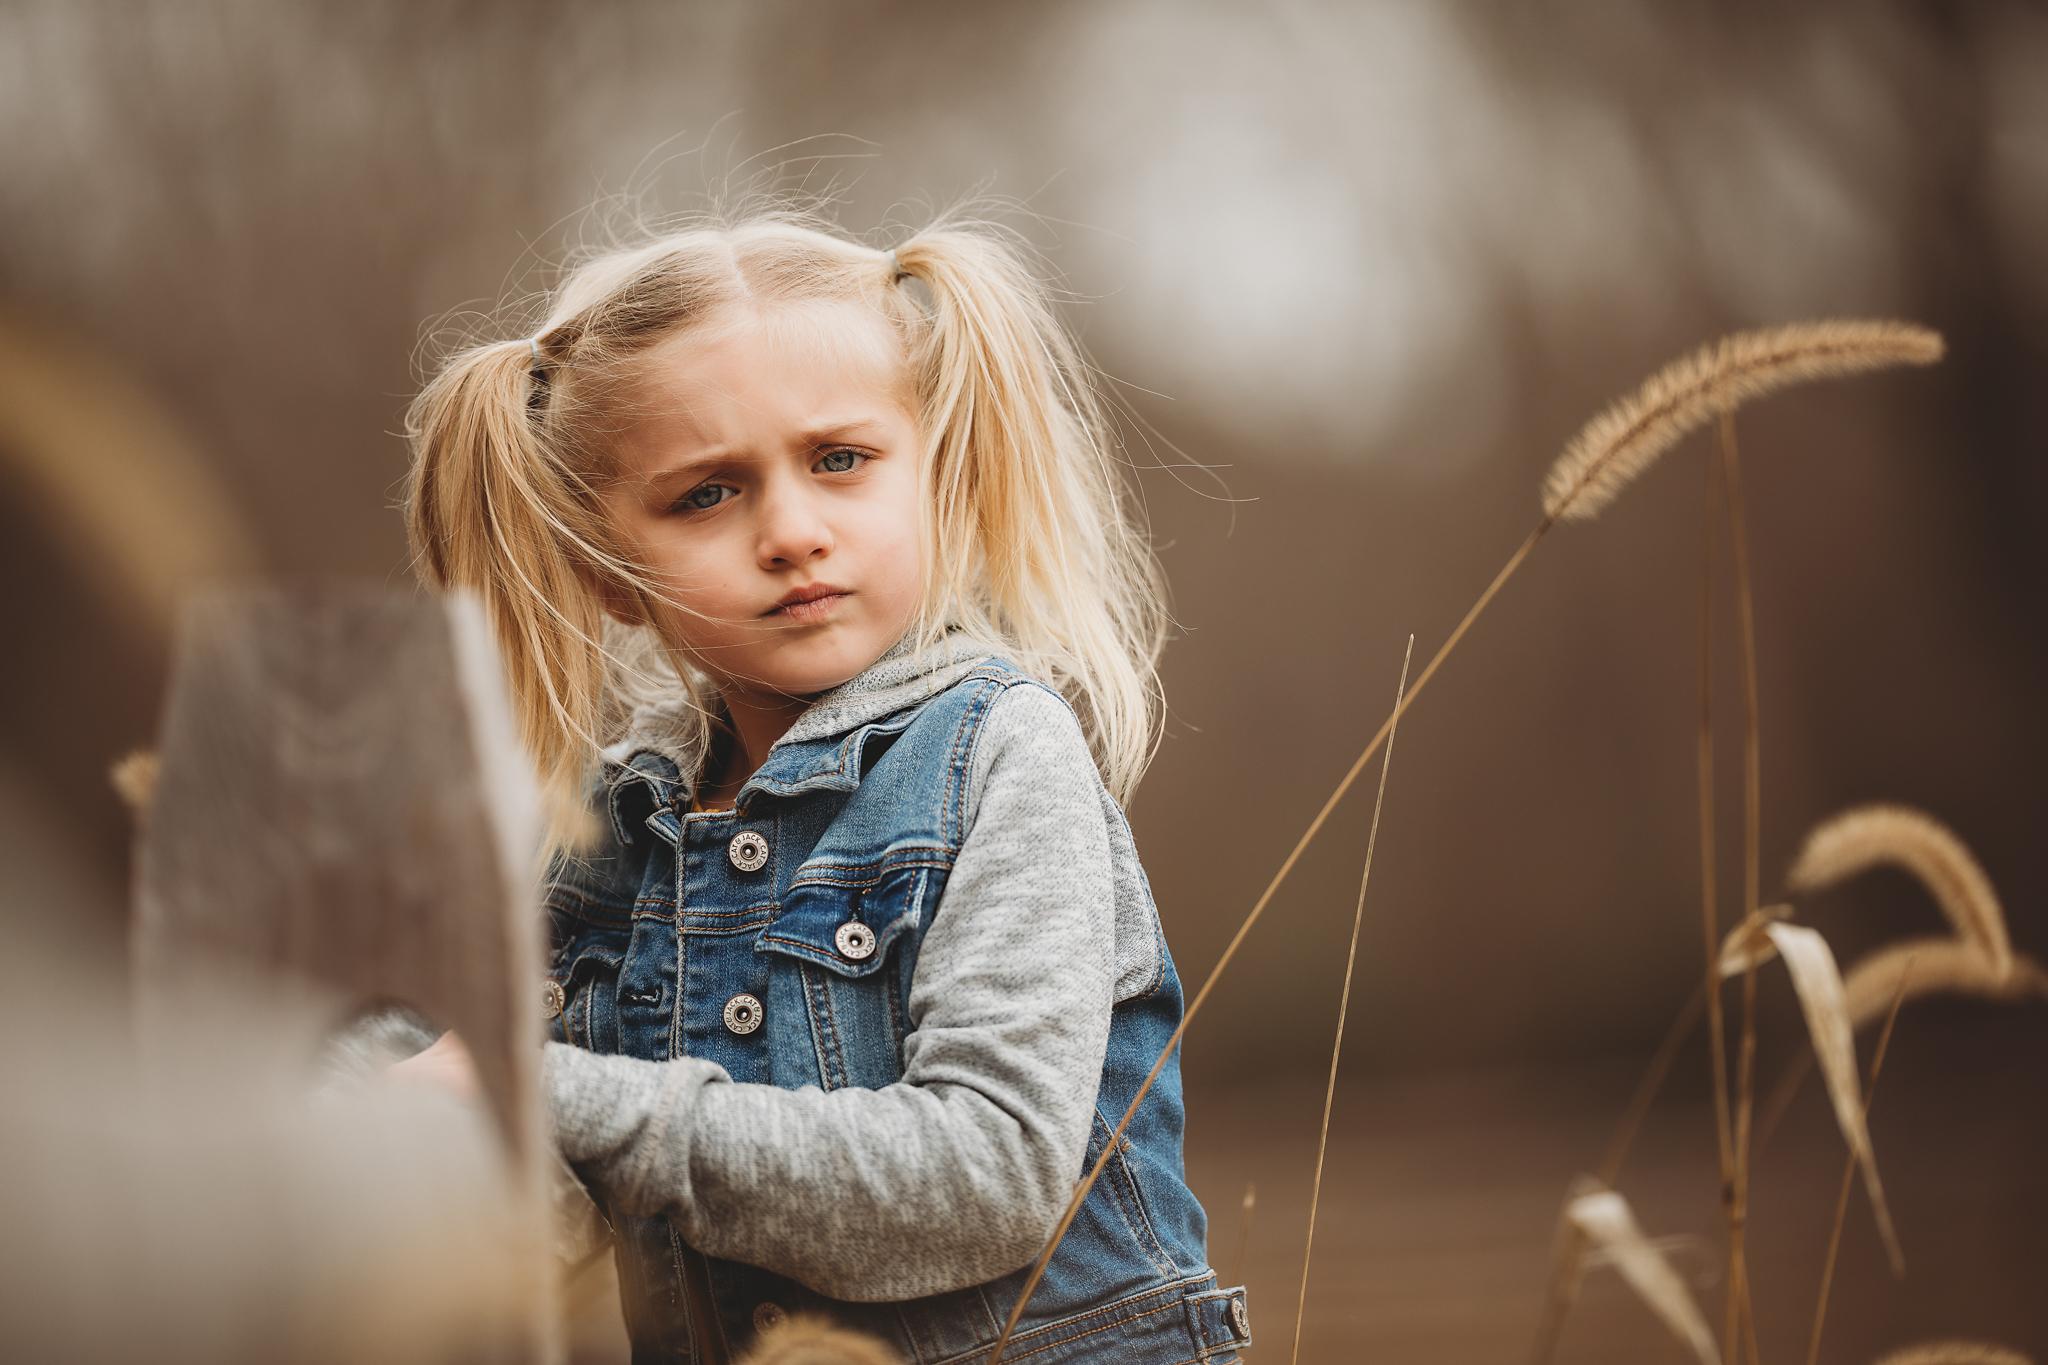 Long-island-photographer-hello-olivia-photography-children-kids-photos-new-york-lifestyle-portraits-suffolk-County-LI-41.jpg